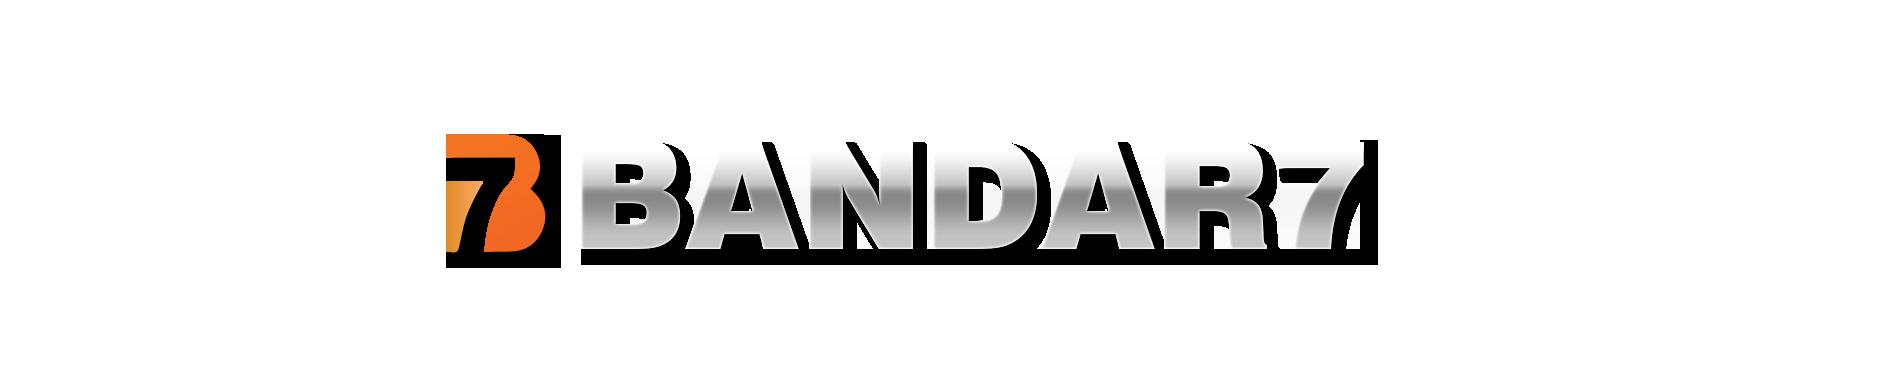 BANDAR7